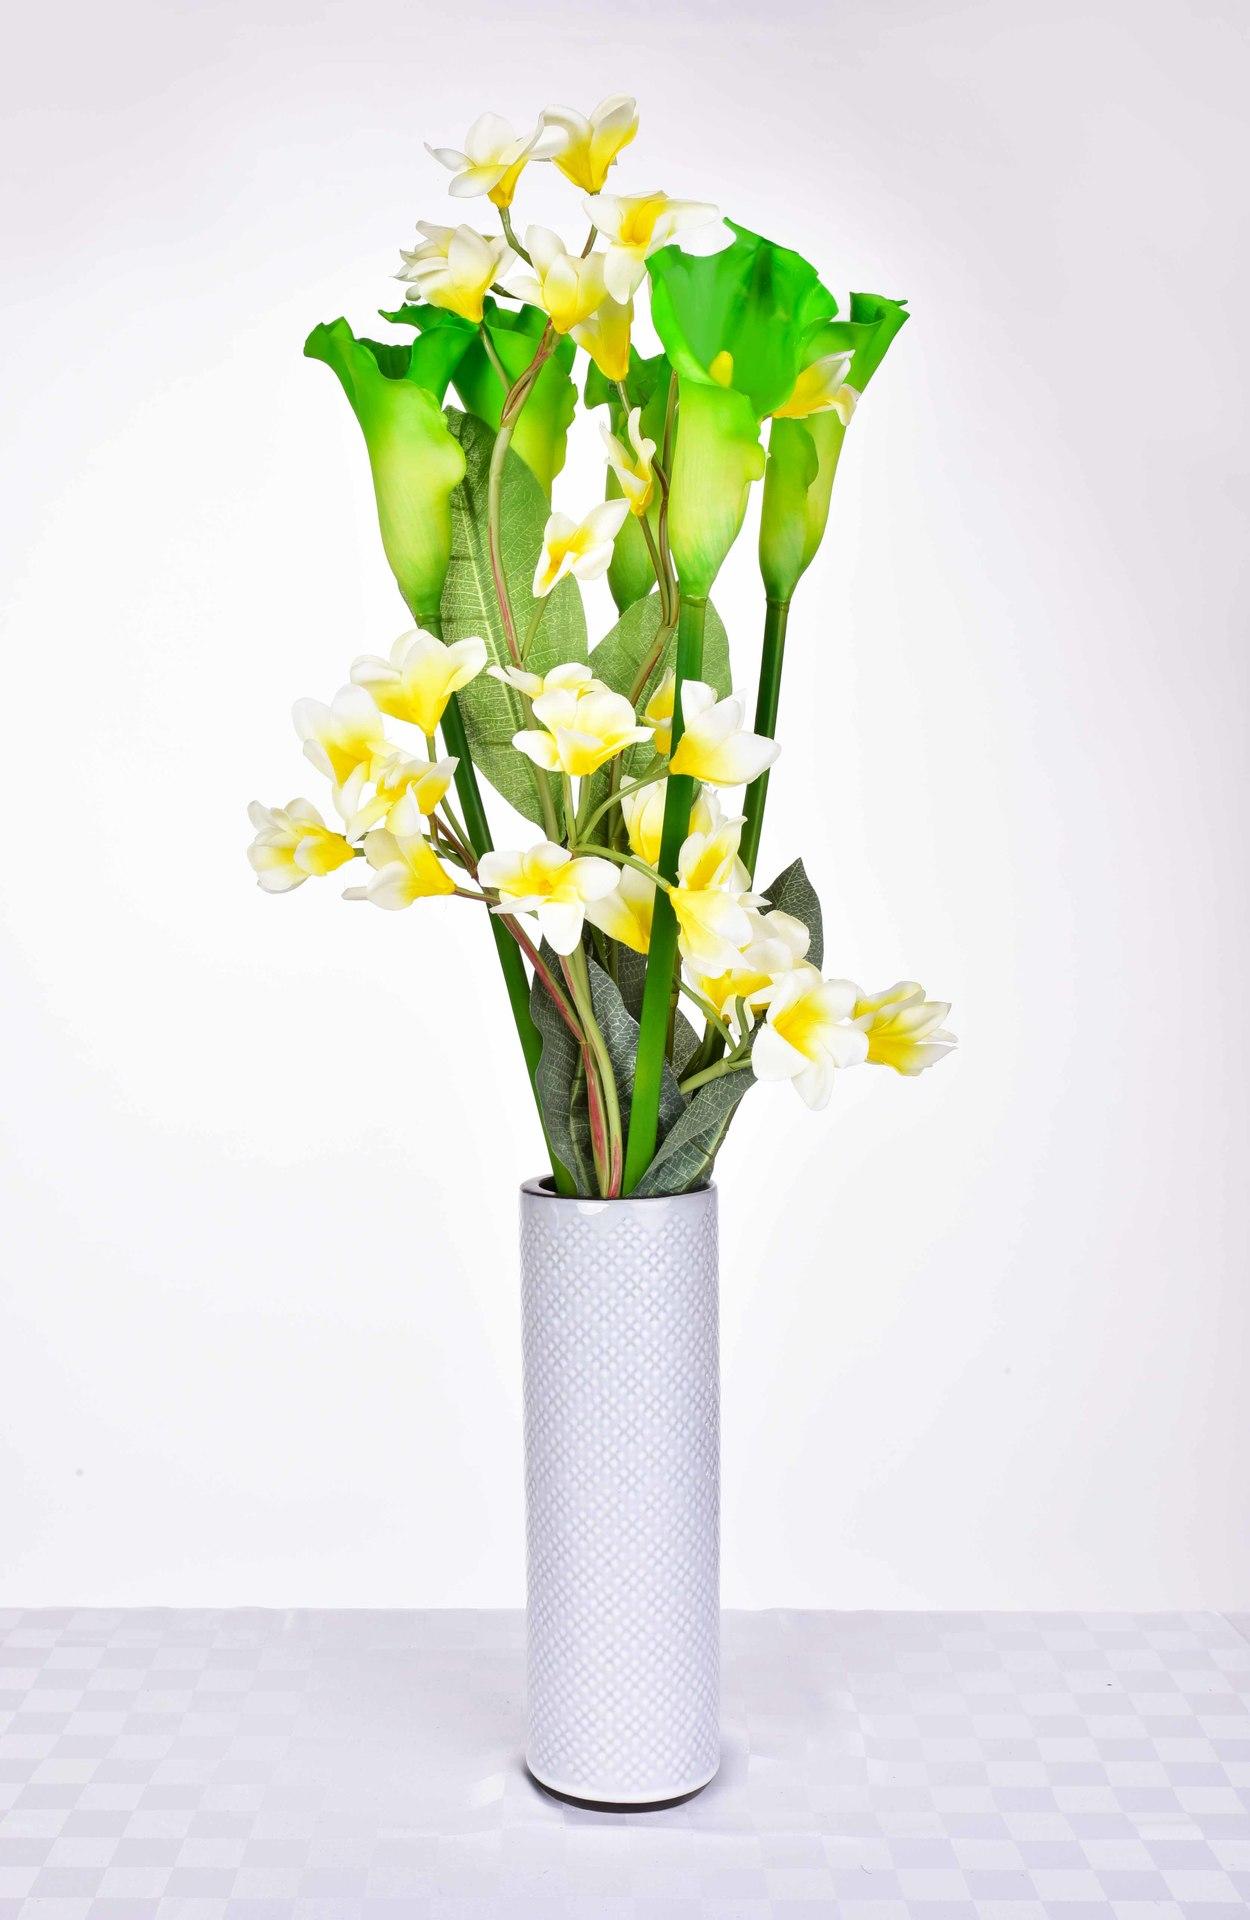 Calla zelená, výška 77 cm